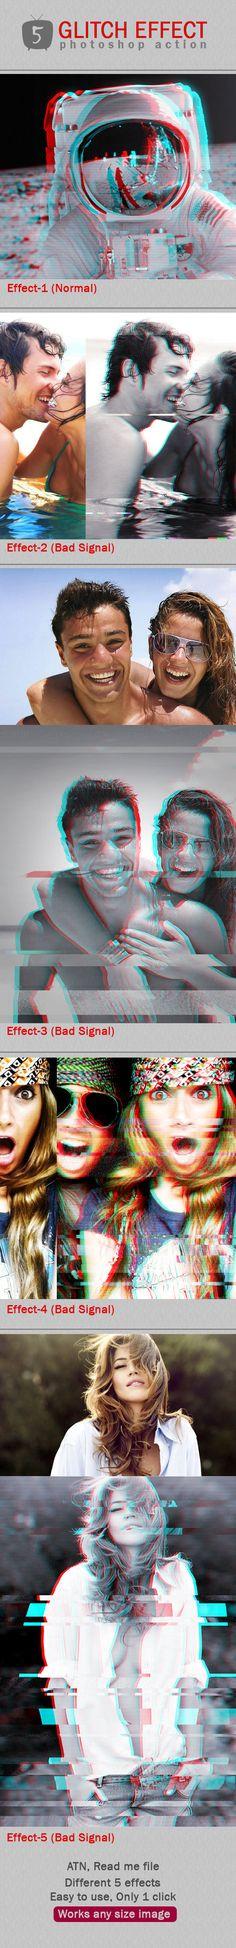 Glitch Photoshop Effects #photoeffect Download: http://graphicriver.net/item/glitch-ps-effects/12048608?ref=ksioks